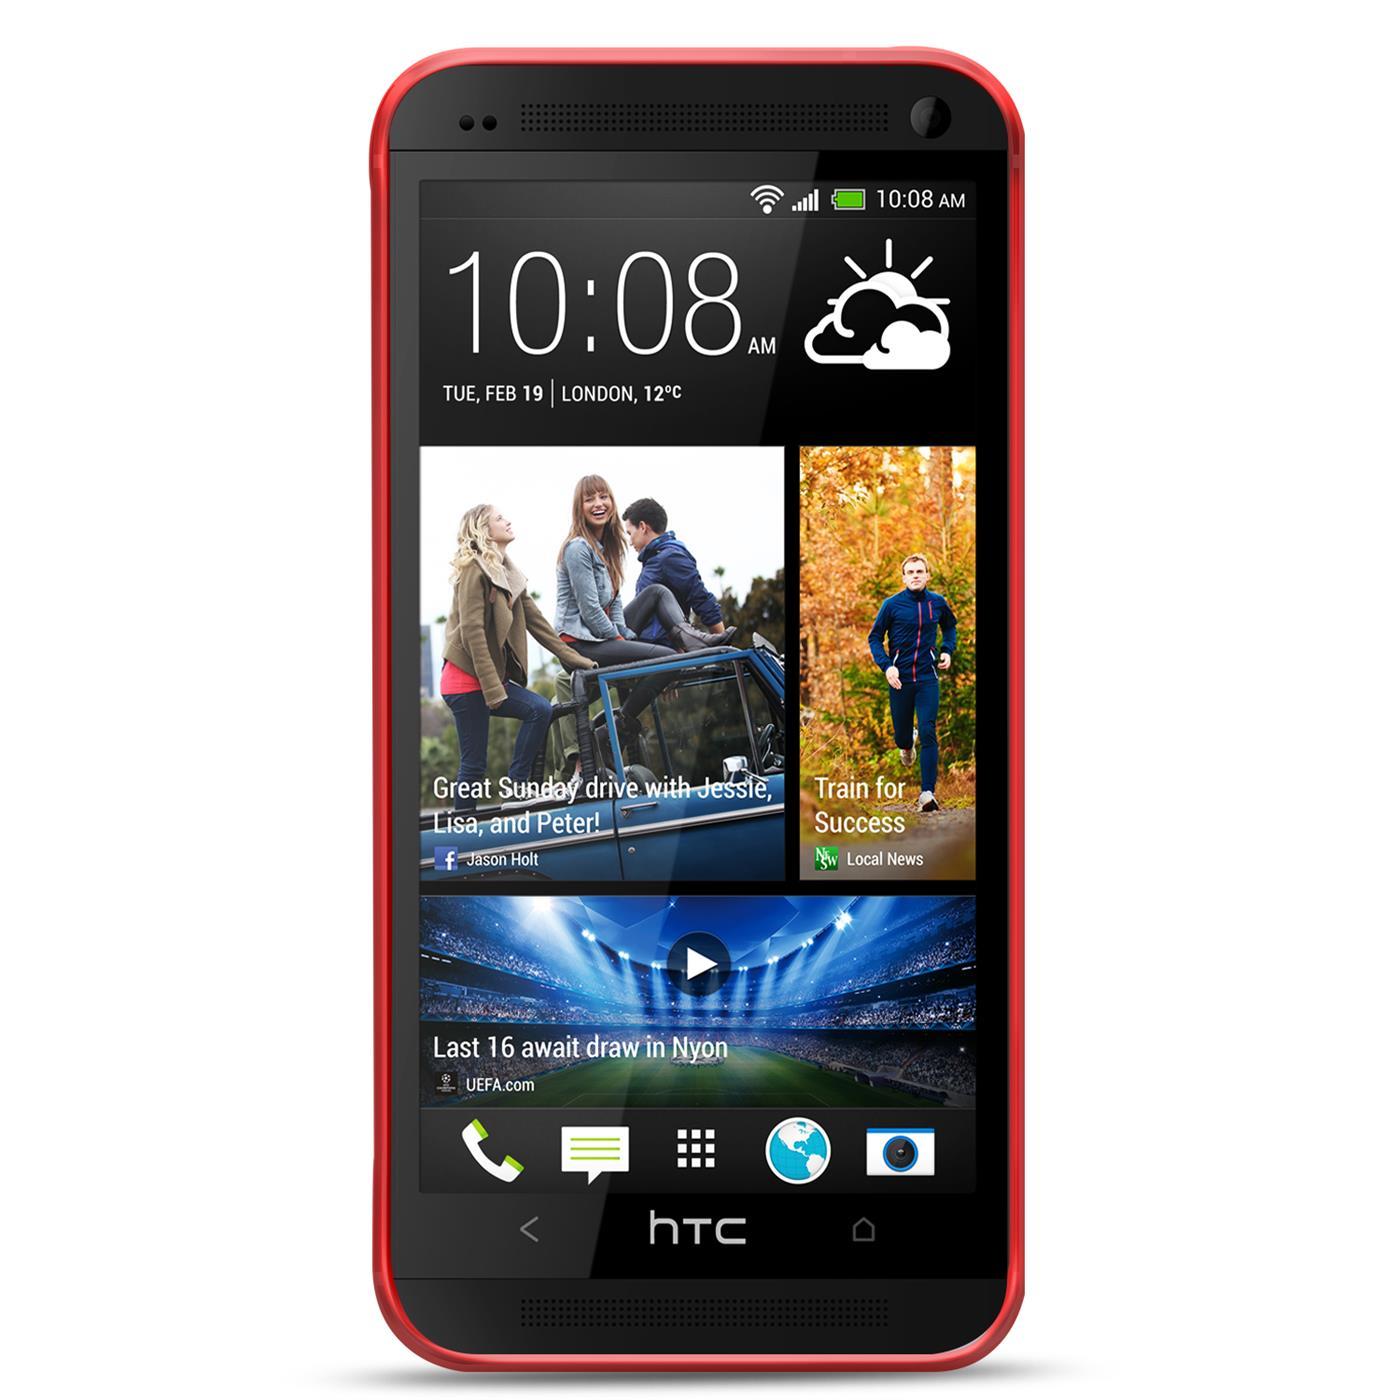 HTC-One-m9-Silikon-Gel-S-Line-Case-Cover-Ultra-Thin-Slim-Back-Bumper Indexbild 17